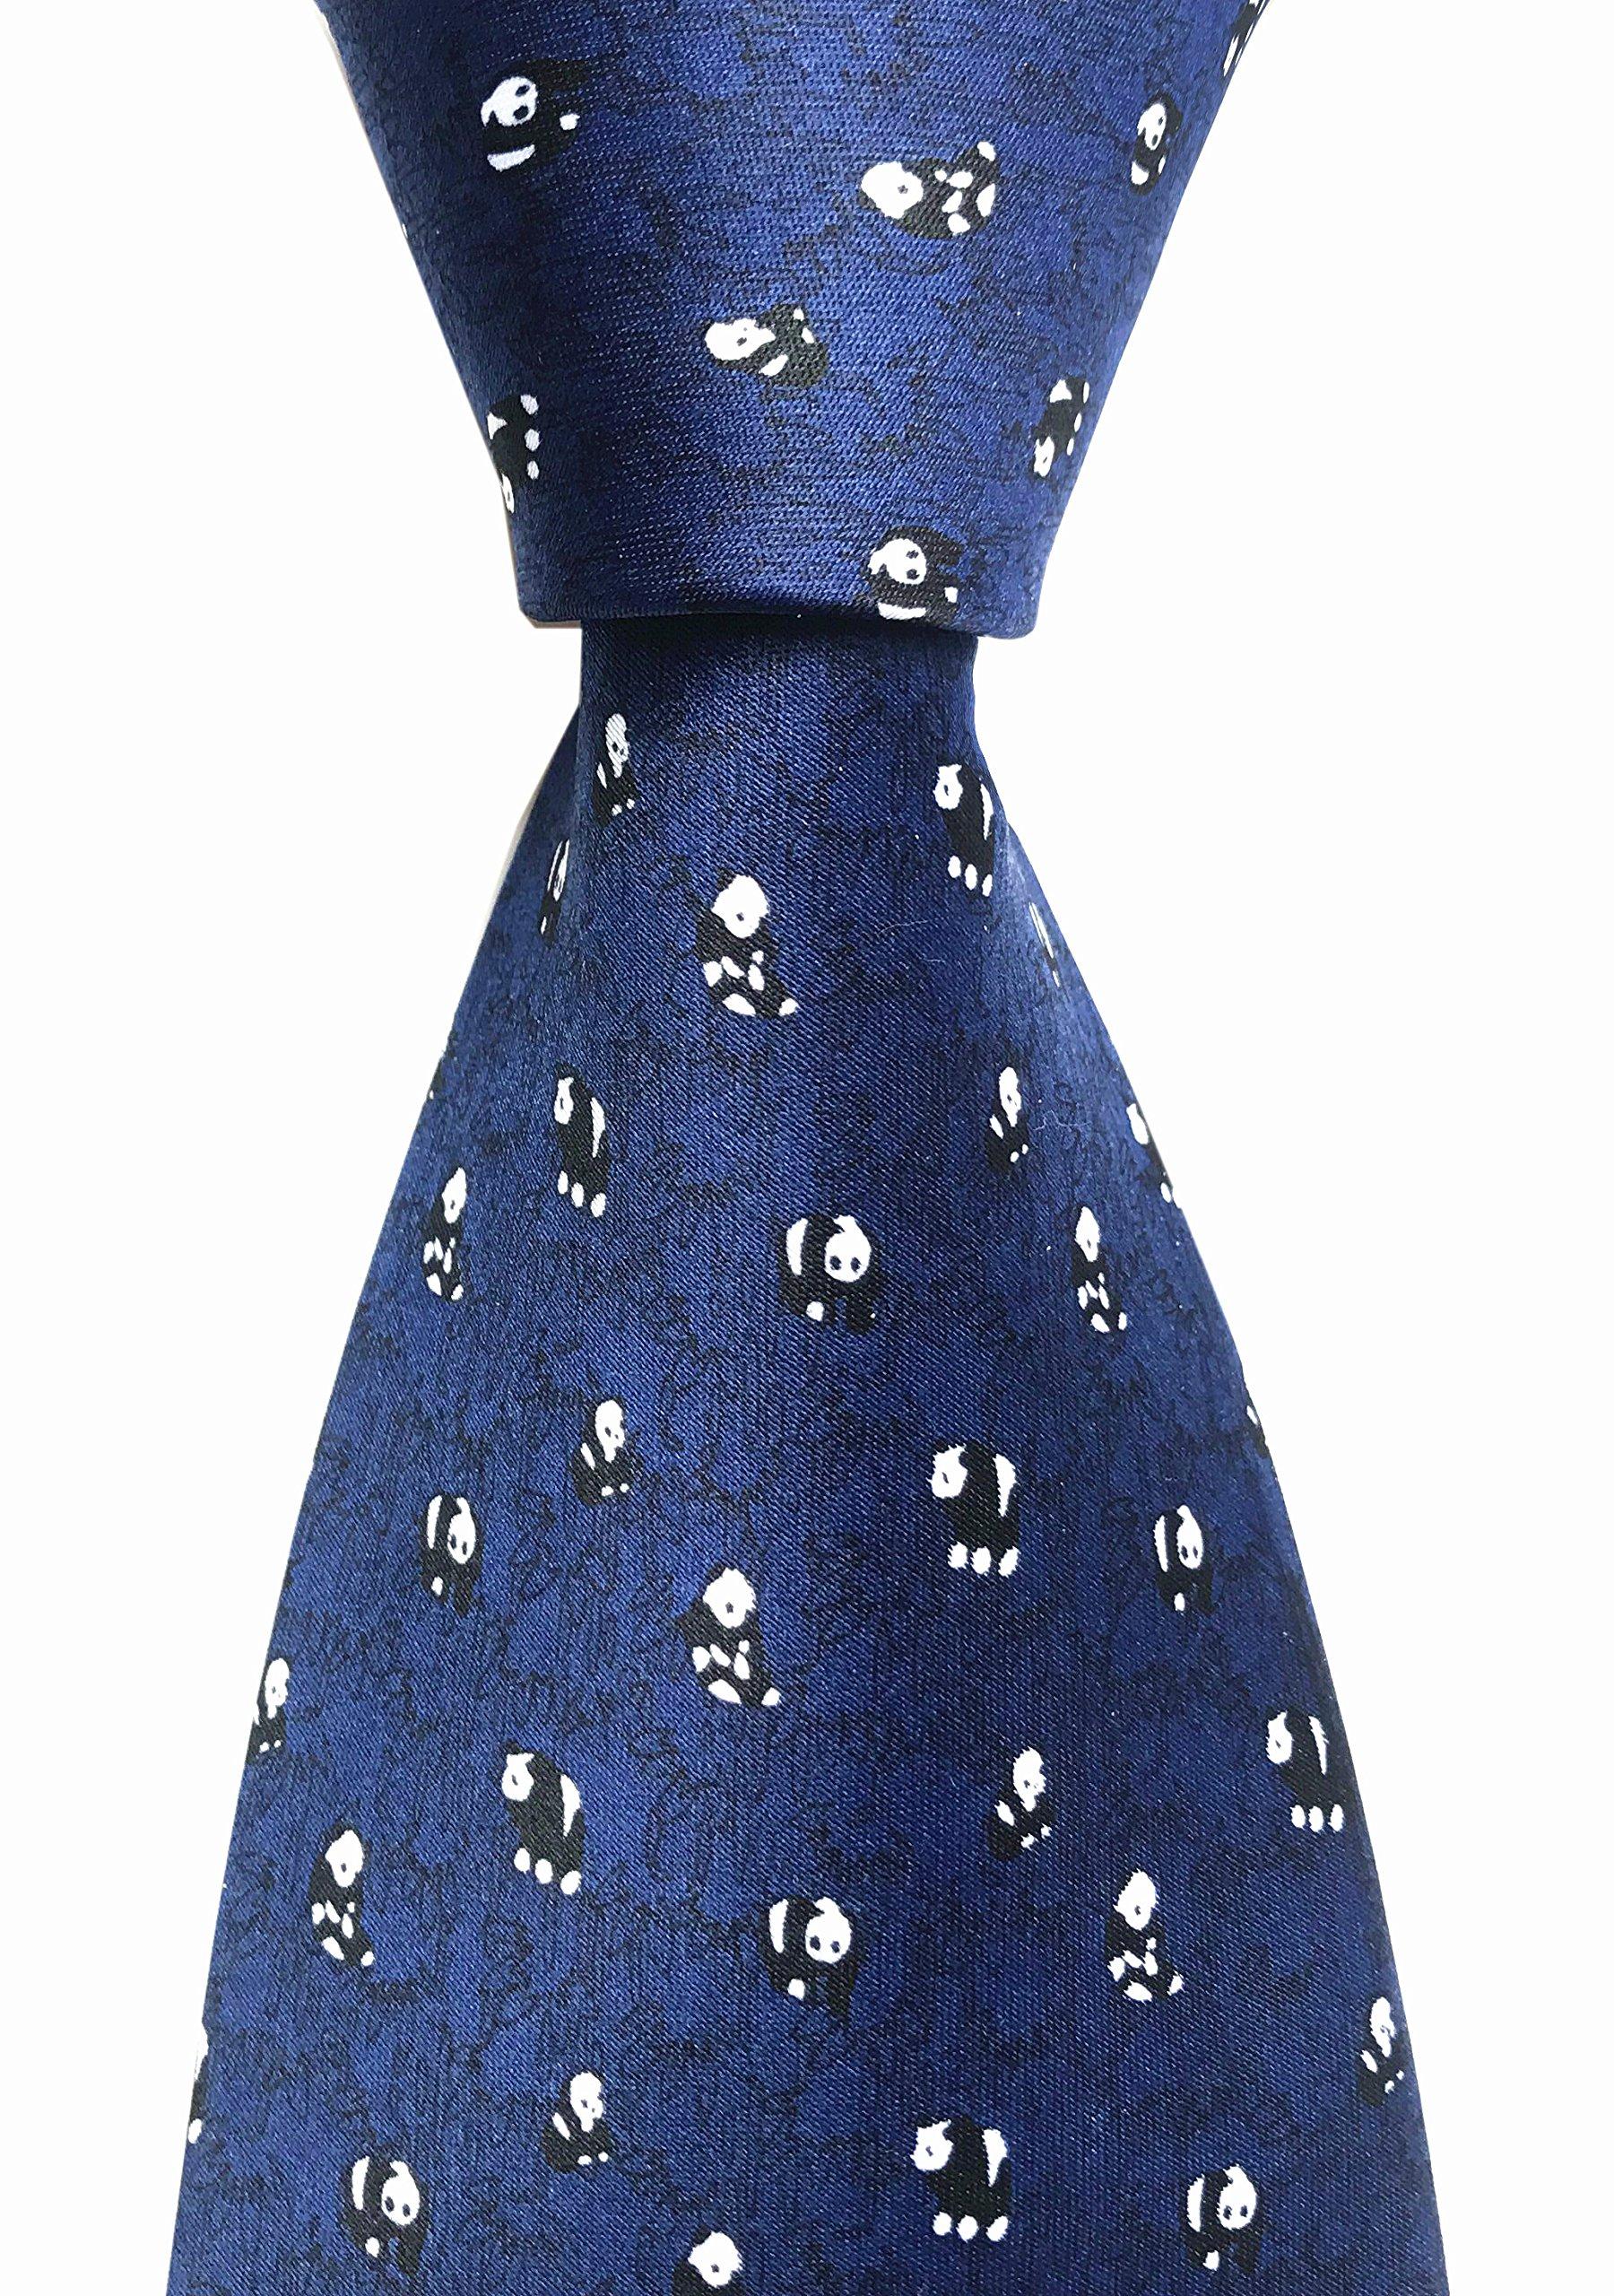 Secdtie Mens Classic Silk Tie Dragon Panda Printed Jacquard Woven Party Necktie